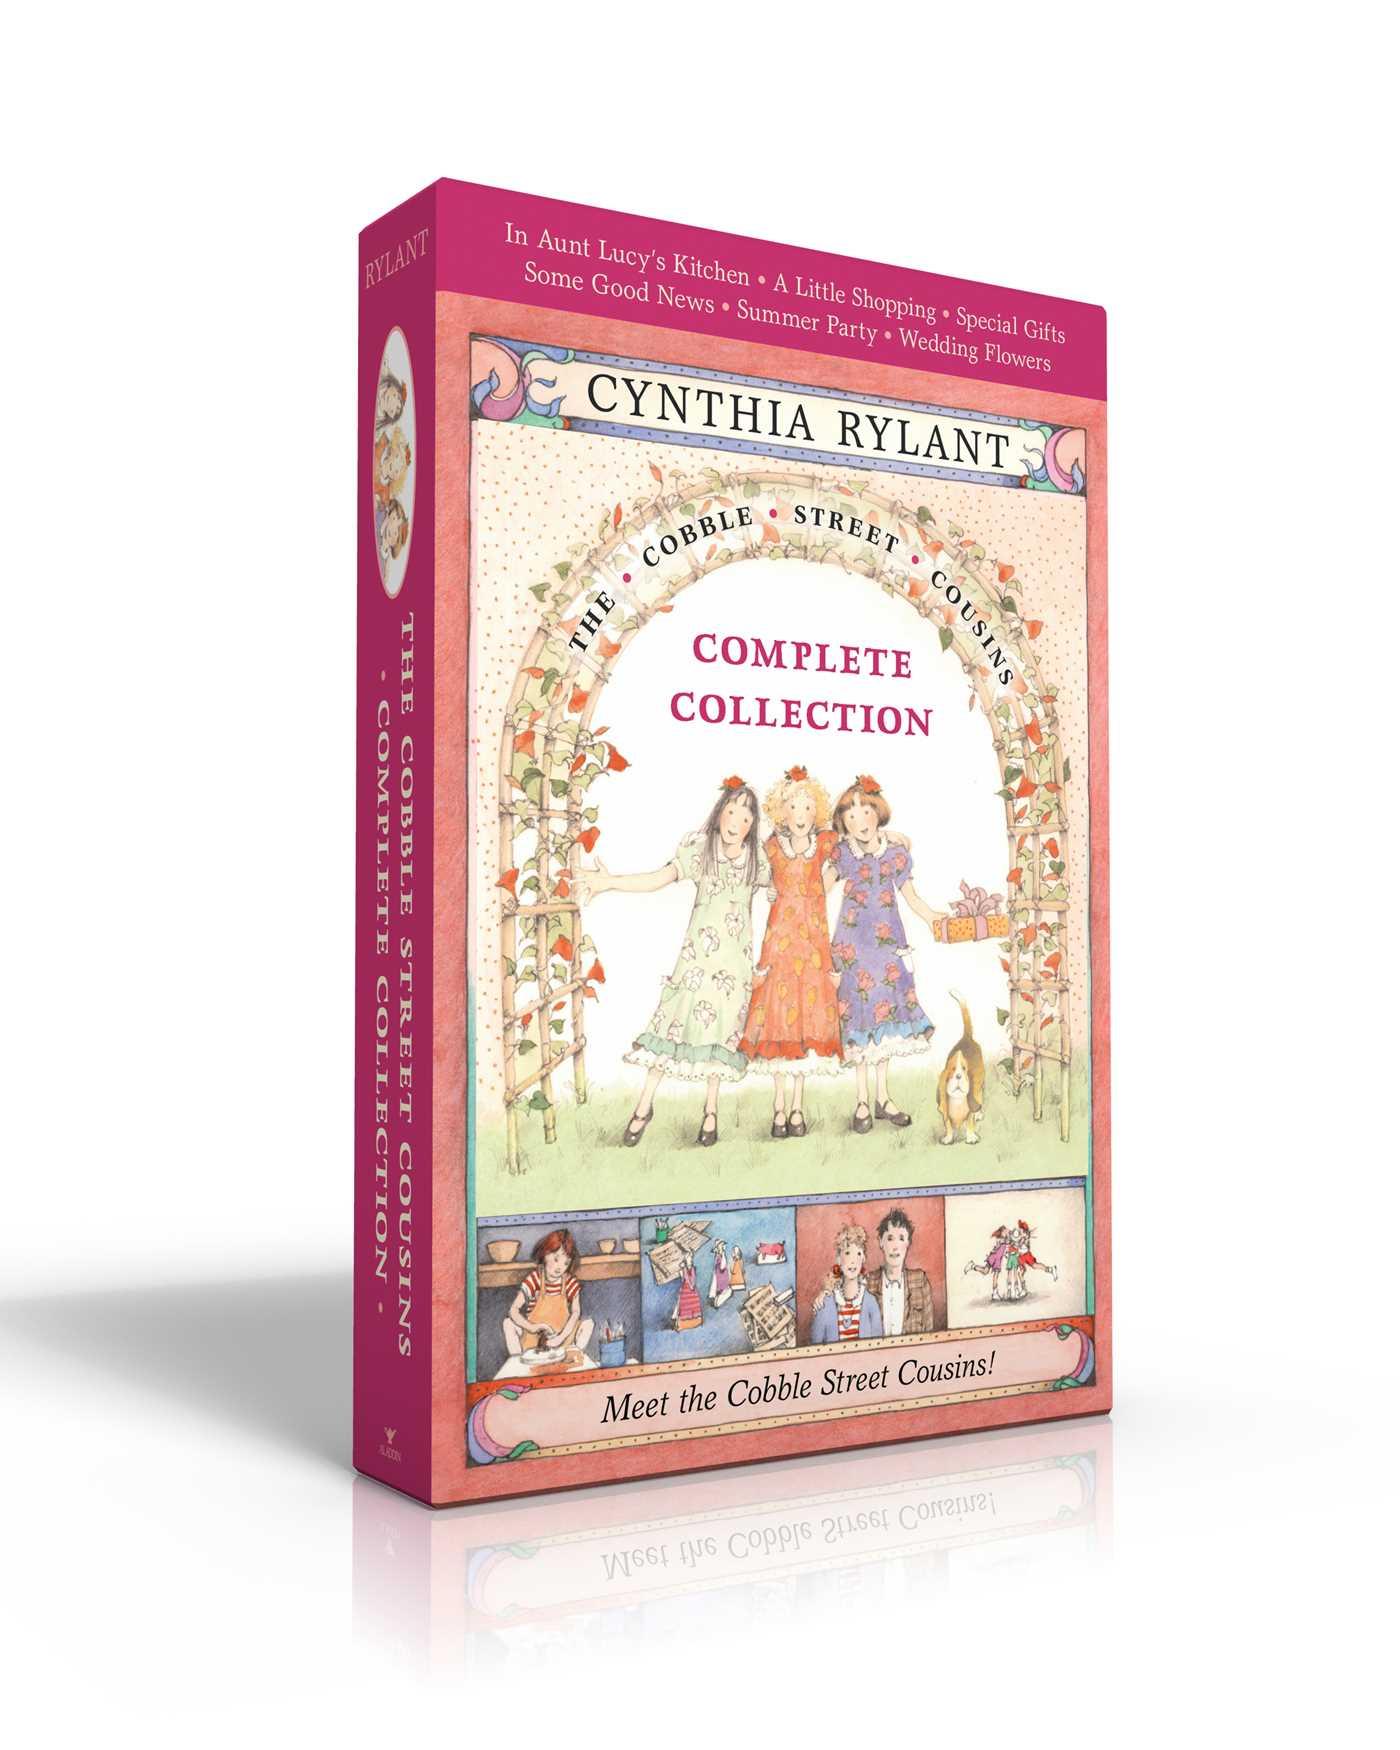 Cobble street cousins complete collection 9781534416338 hr